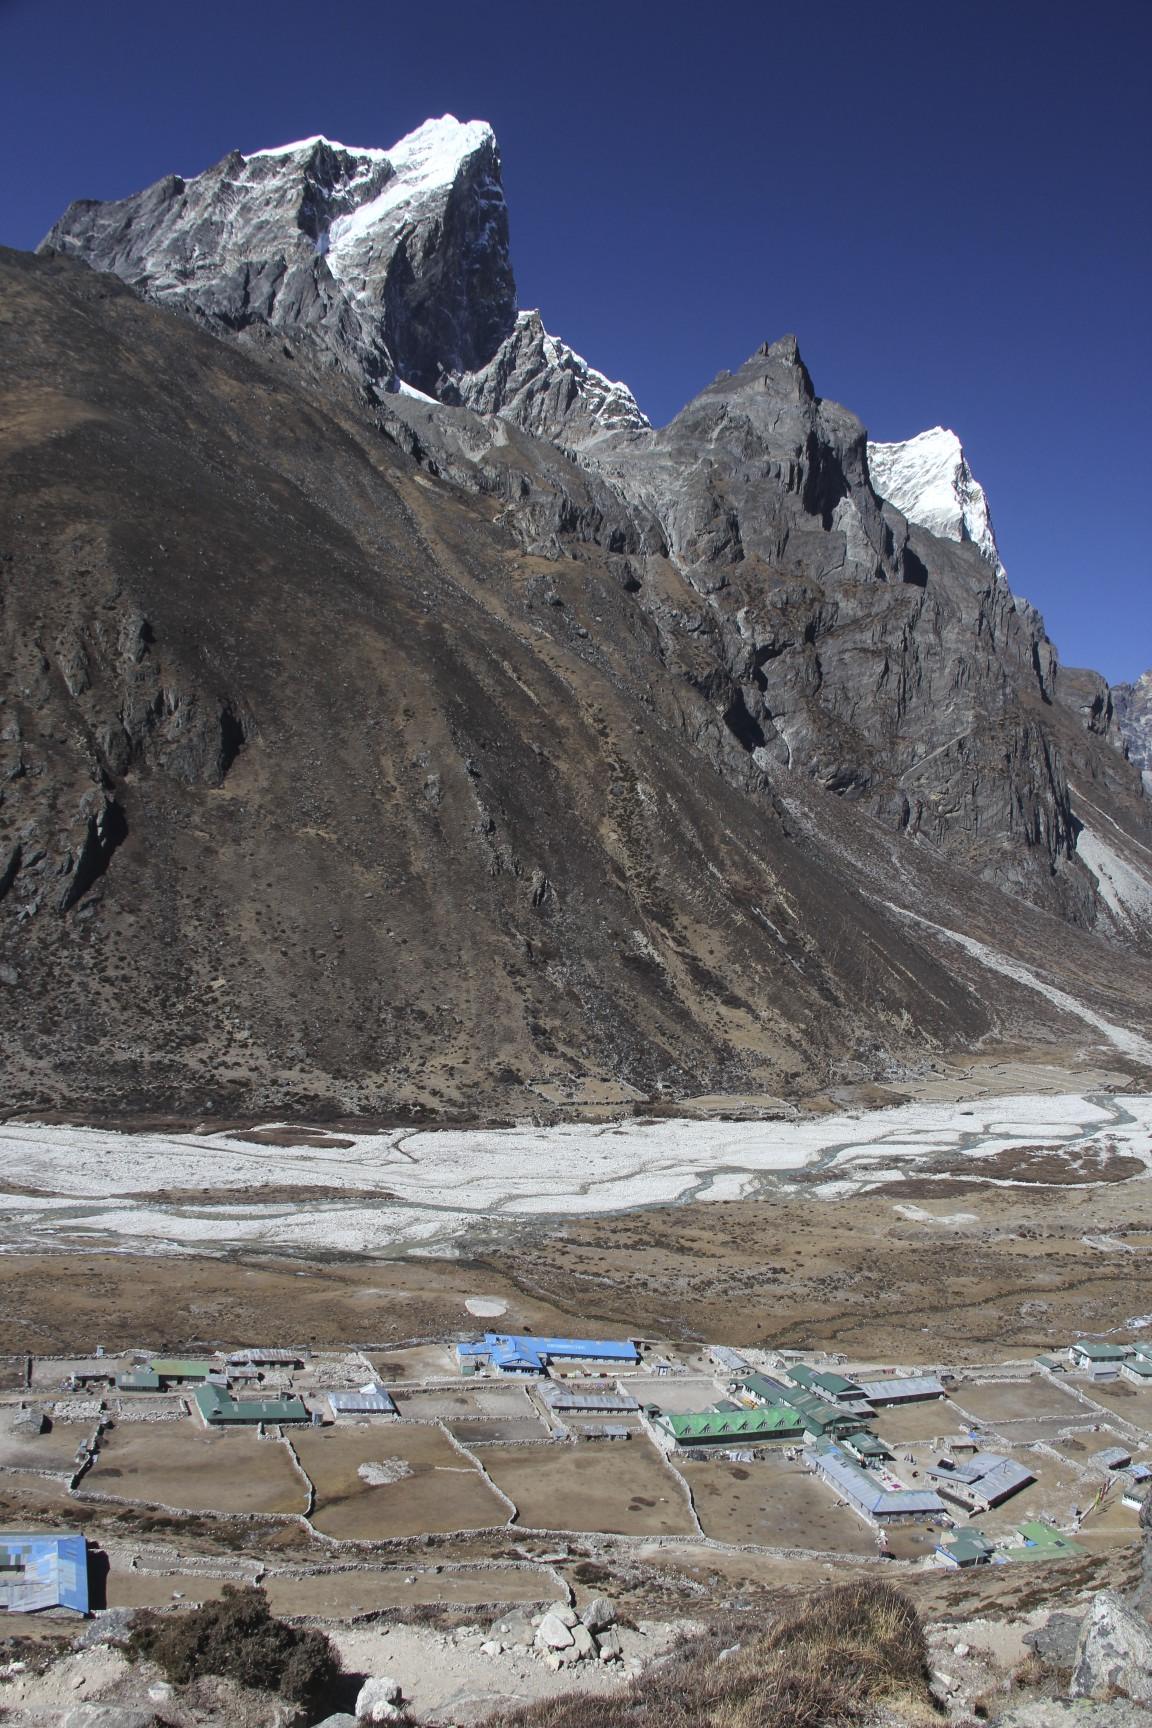 Pheriche village and Mt. Cholatse.